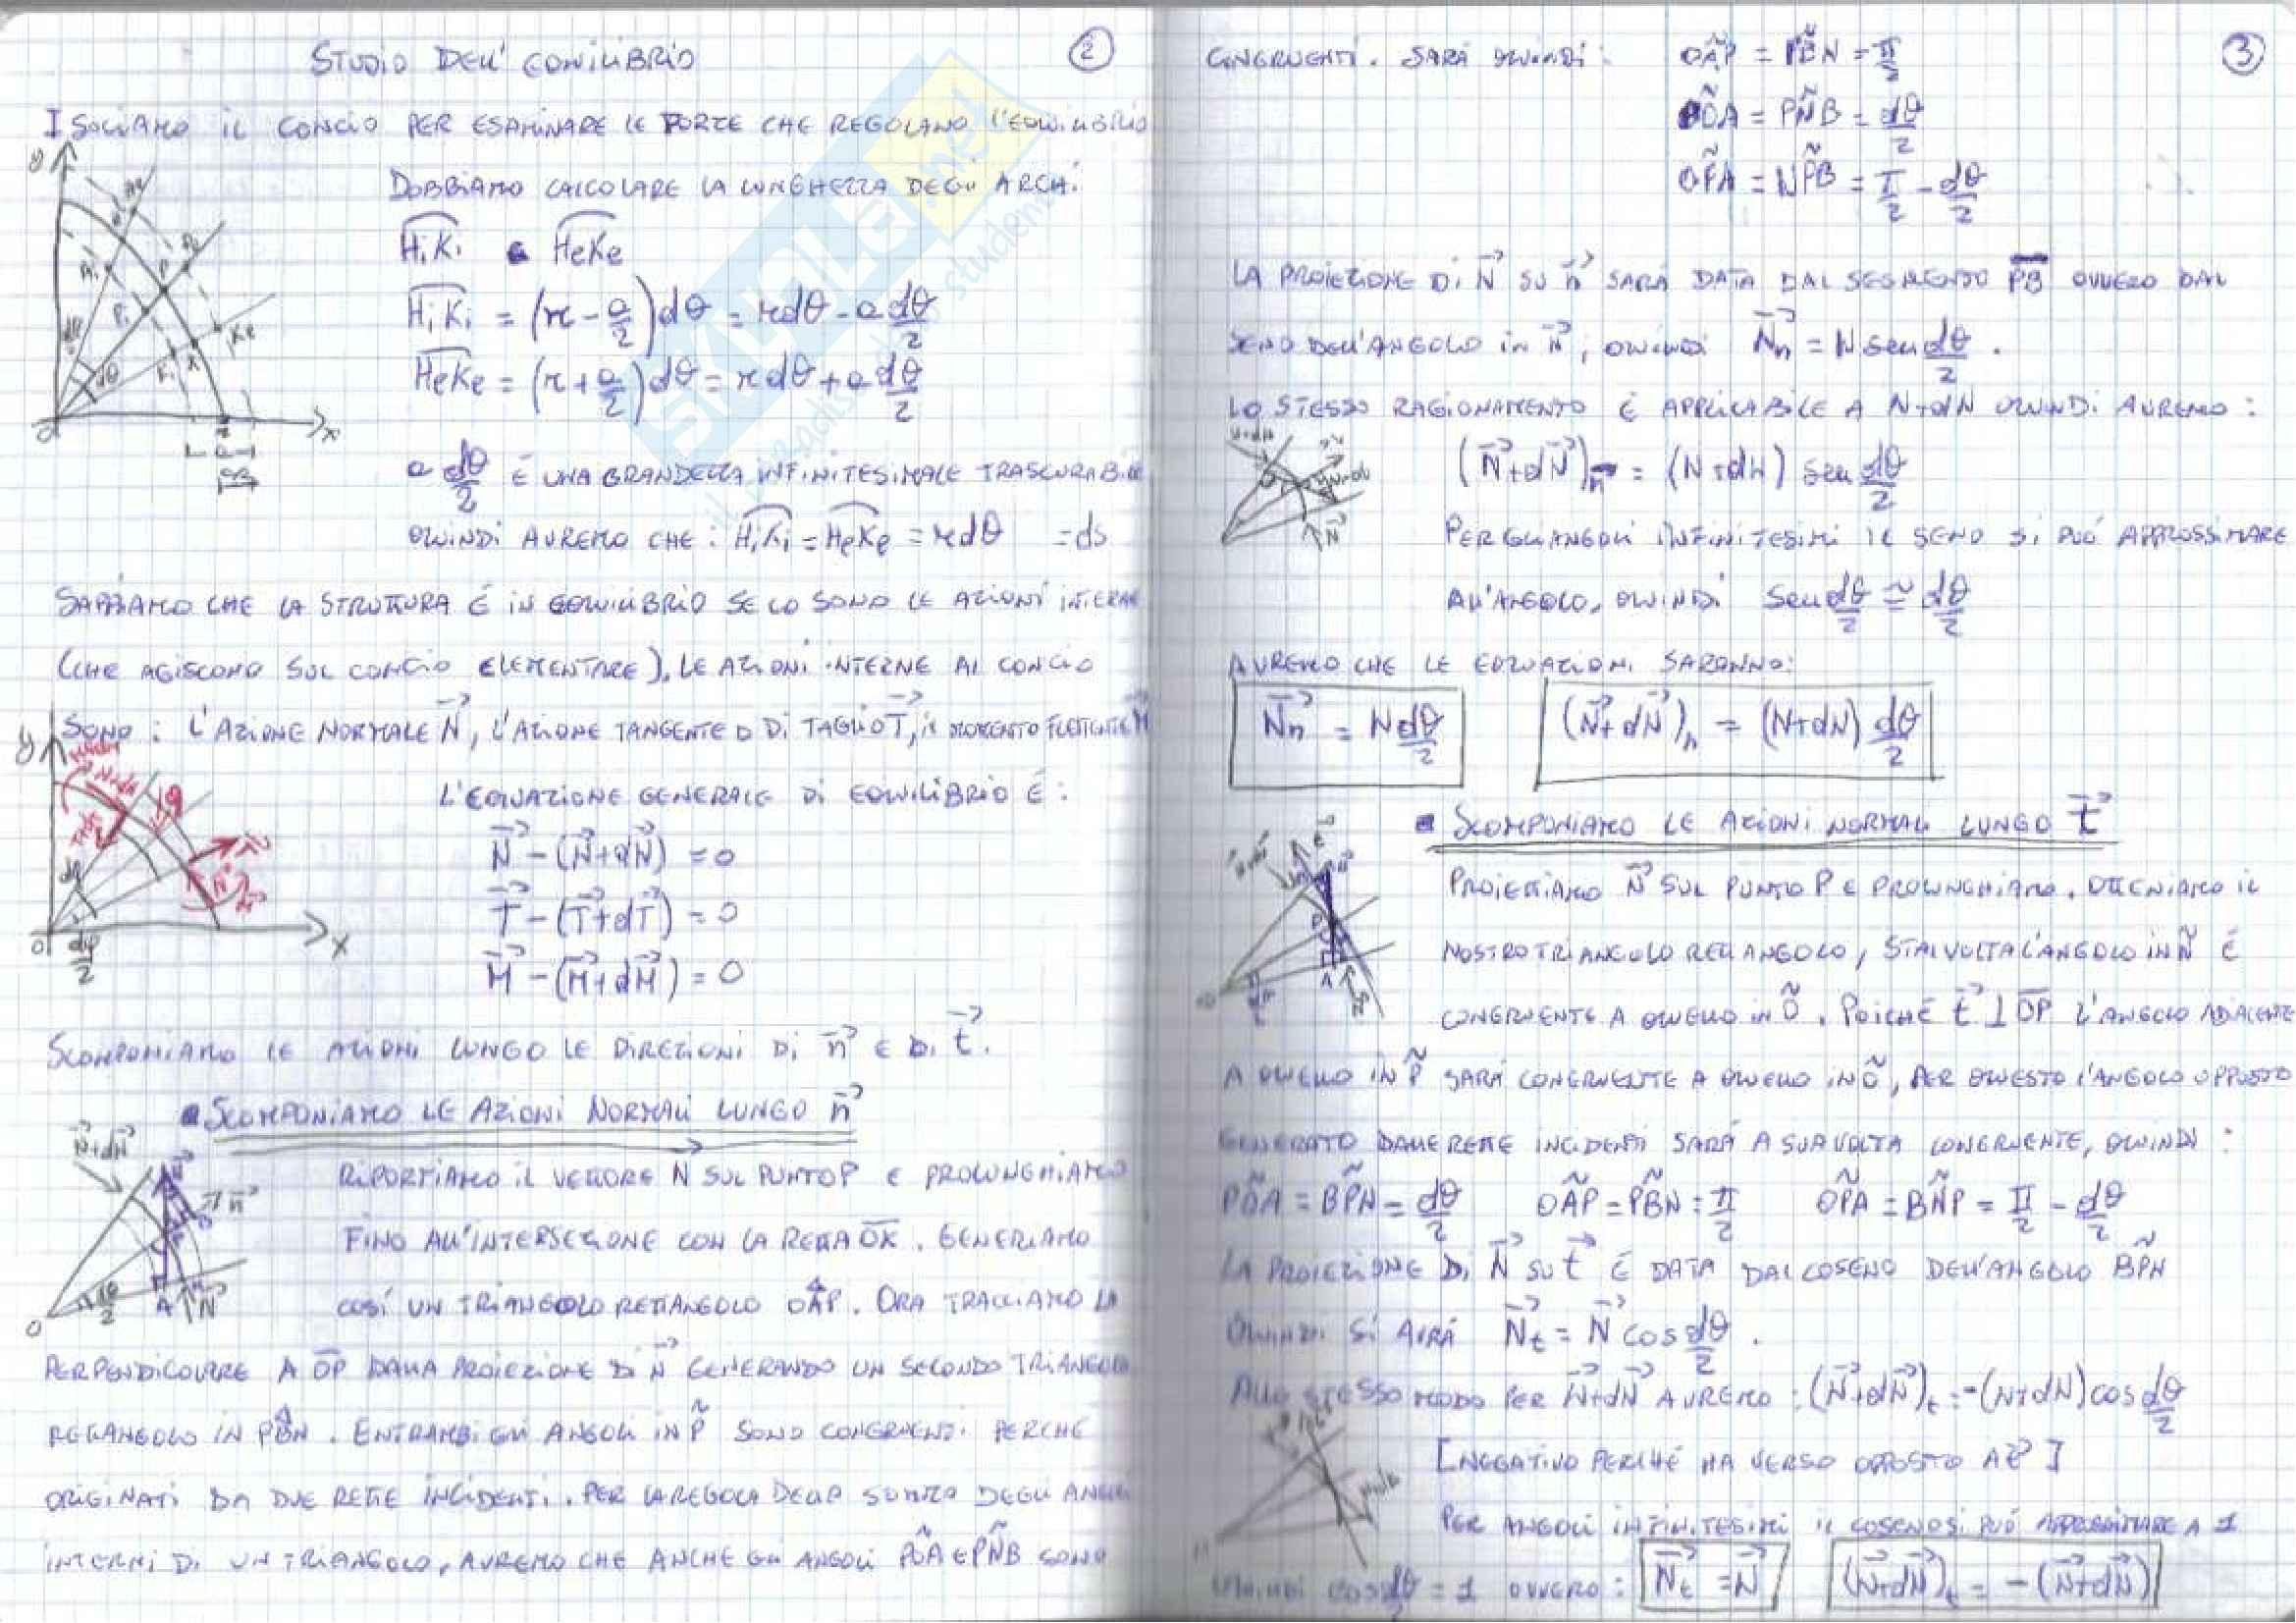 Matematica - Esercitazioni Pag. 2